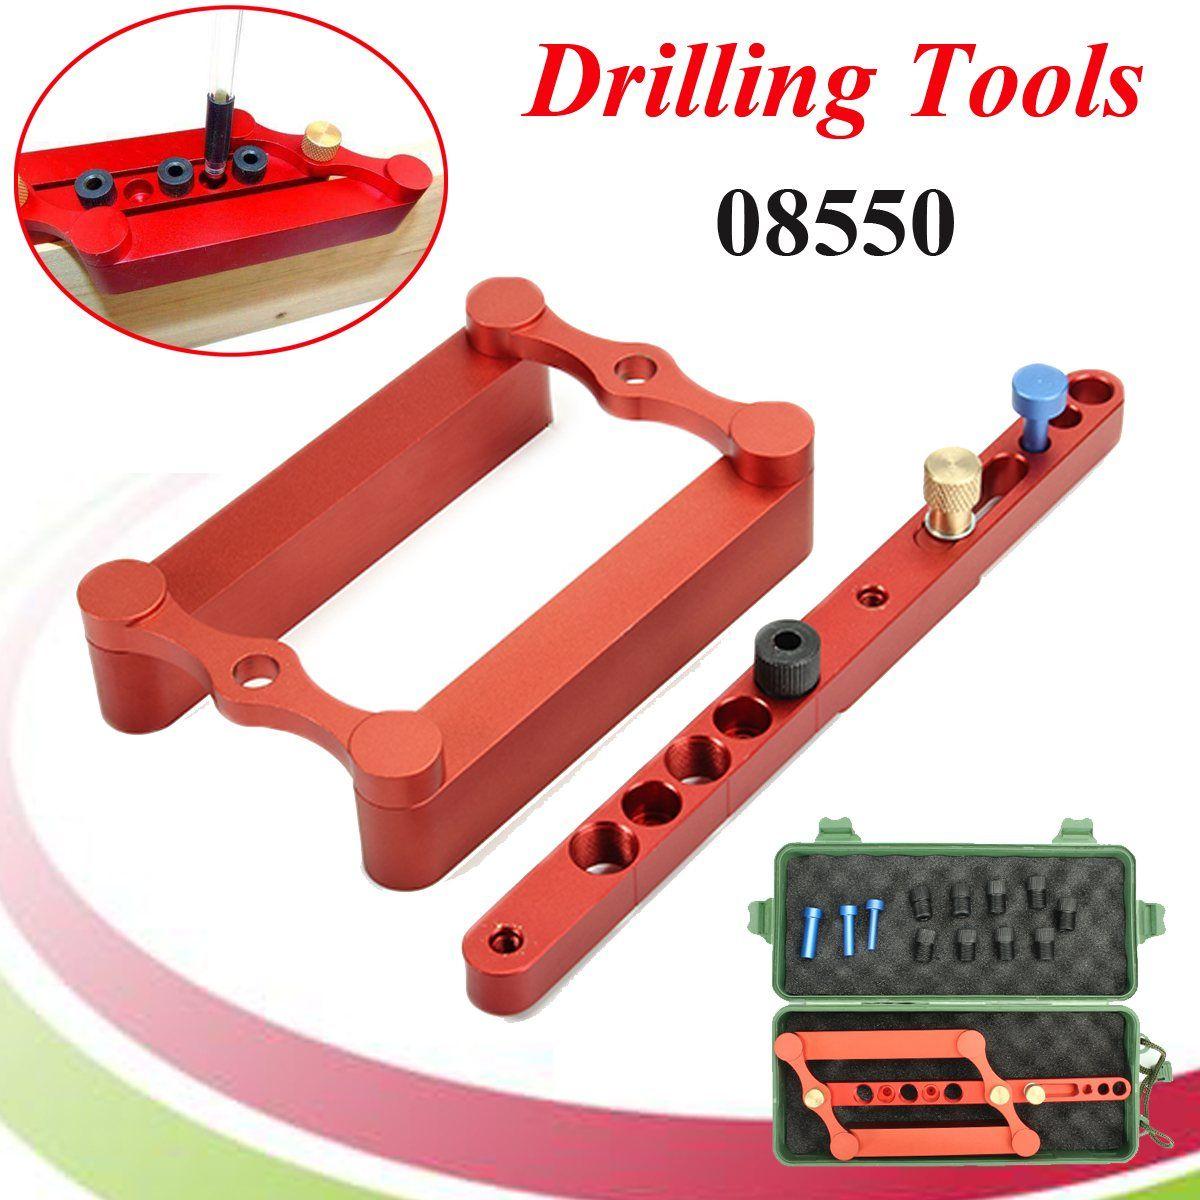 Metric Dowels 6/8/10mm Precise Drilling Tools Woodpeckers Style MT Dowel Jig Self Centering Dowelling Jig